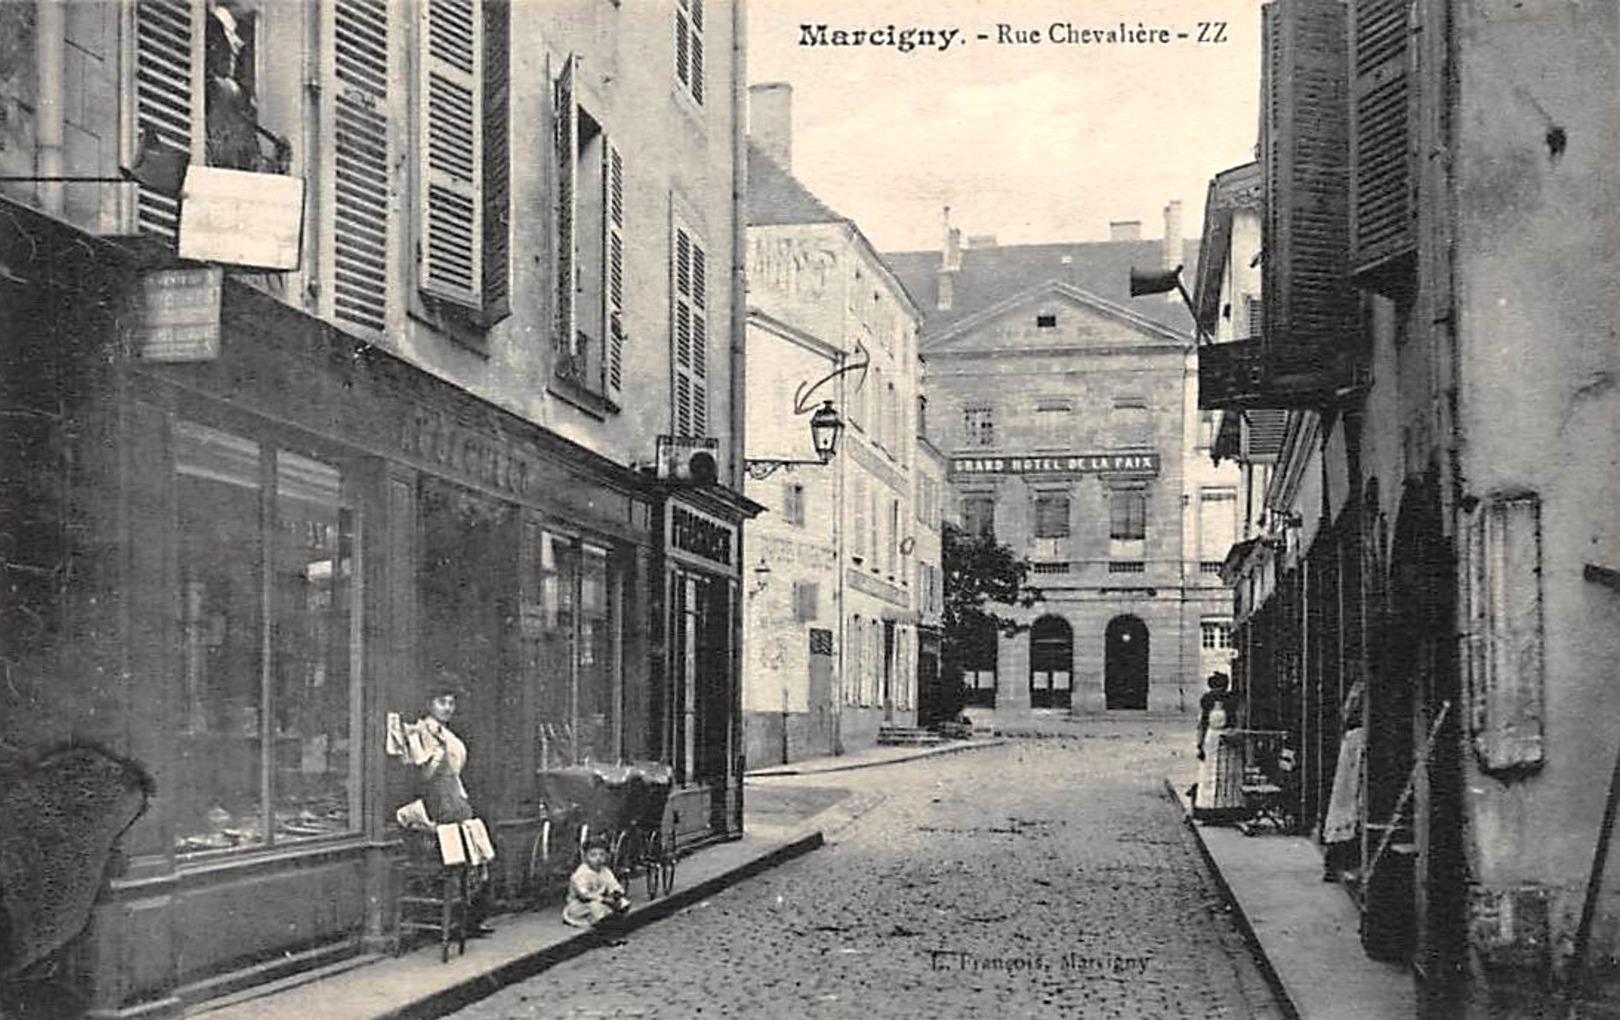 Marcigny (71) Rue Chevalière CPA